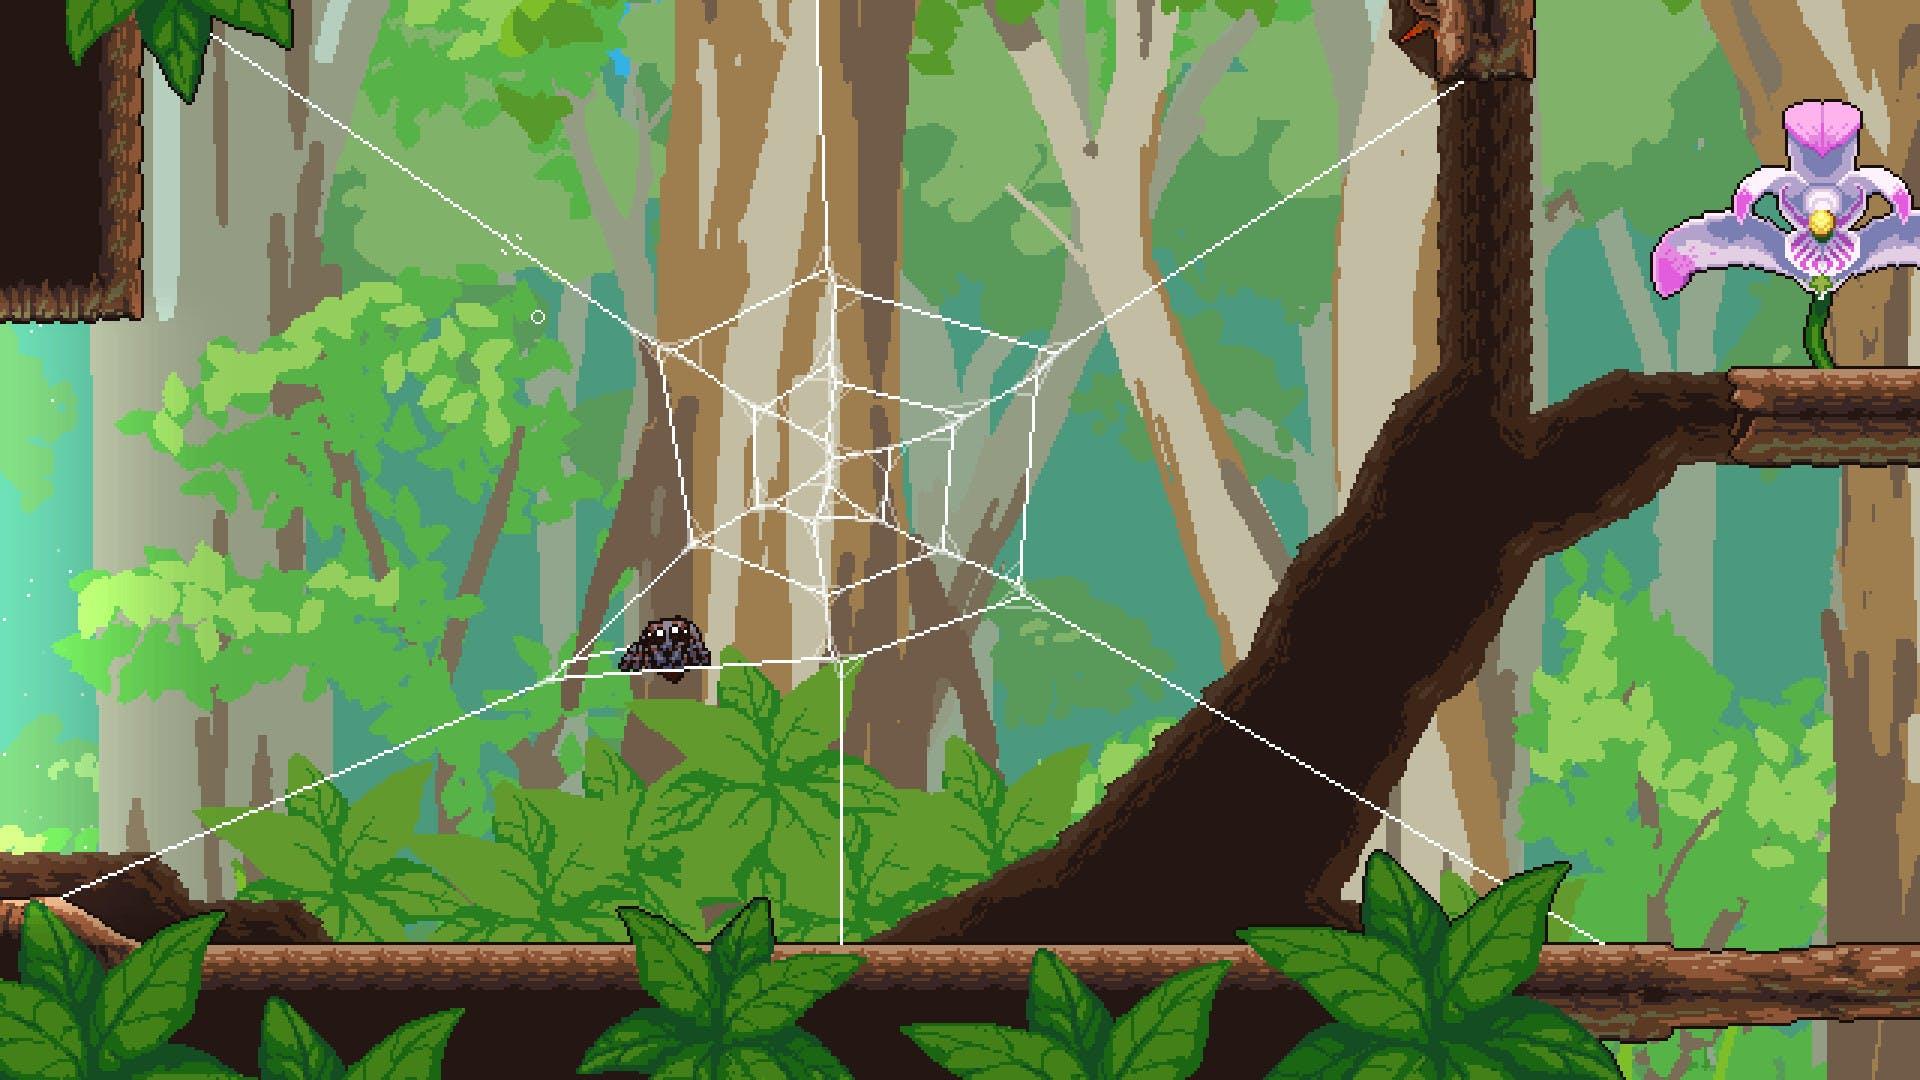 Webbed - Made with Gamemaker Studio